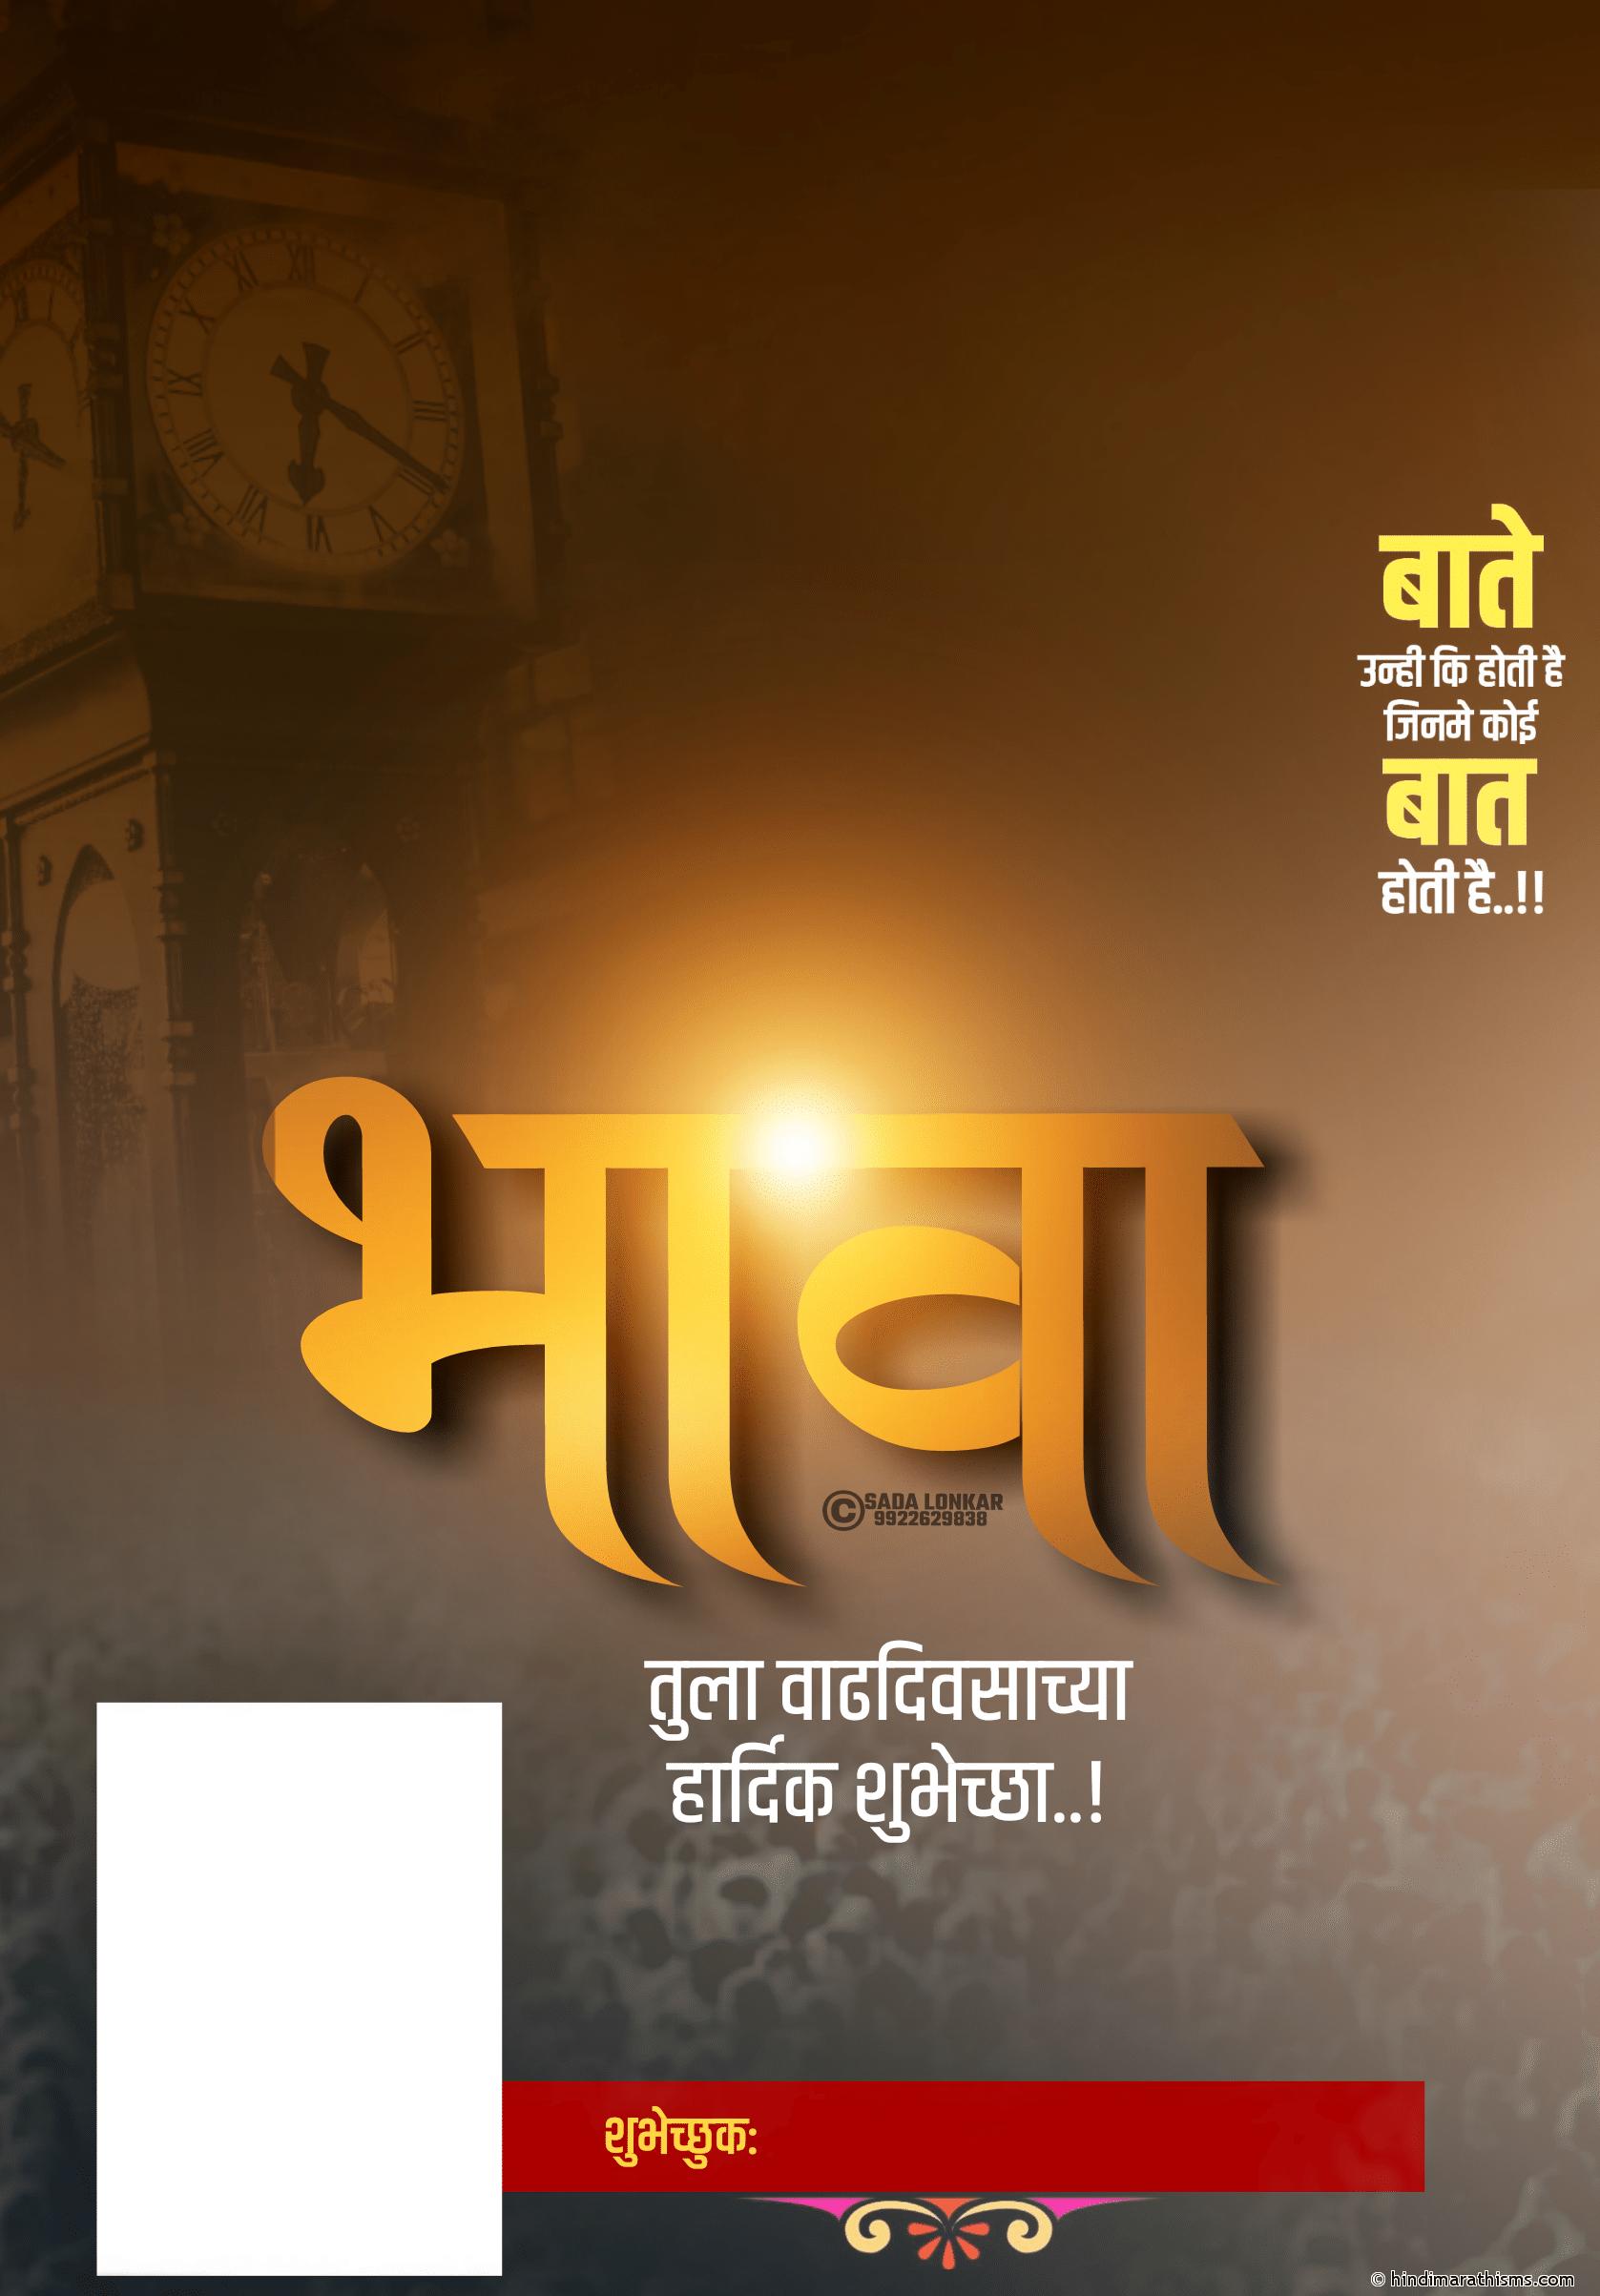 Bhava Tula Vadhdivsachya Shubhechha Banner Image